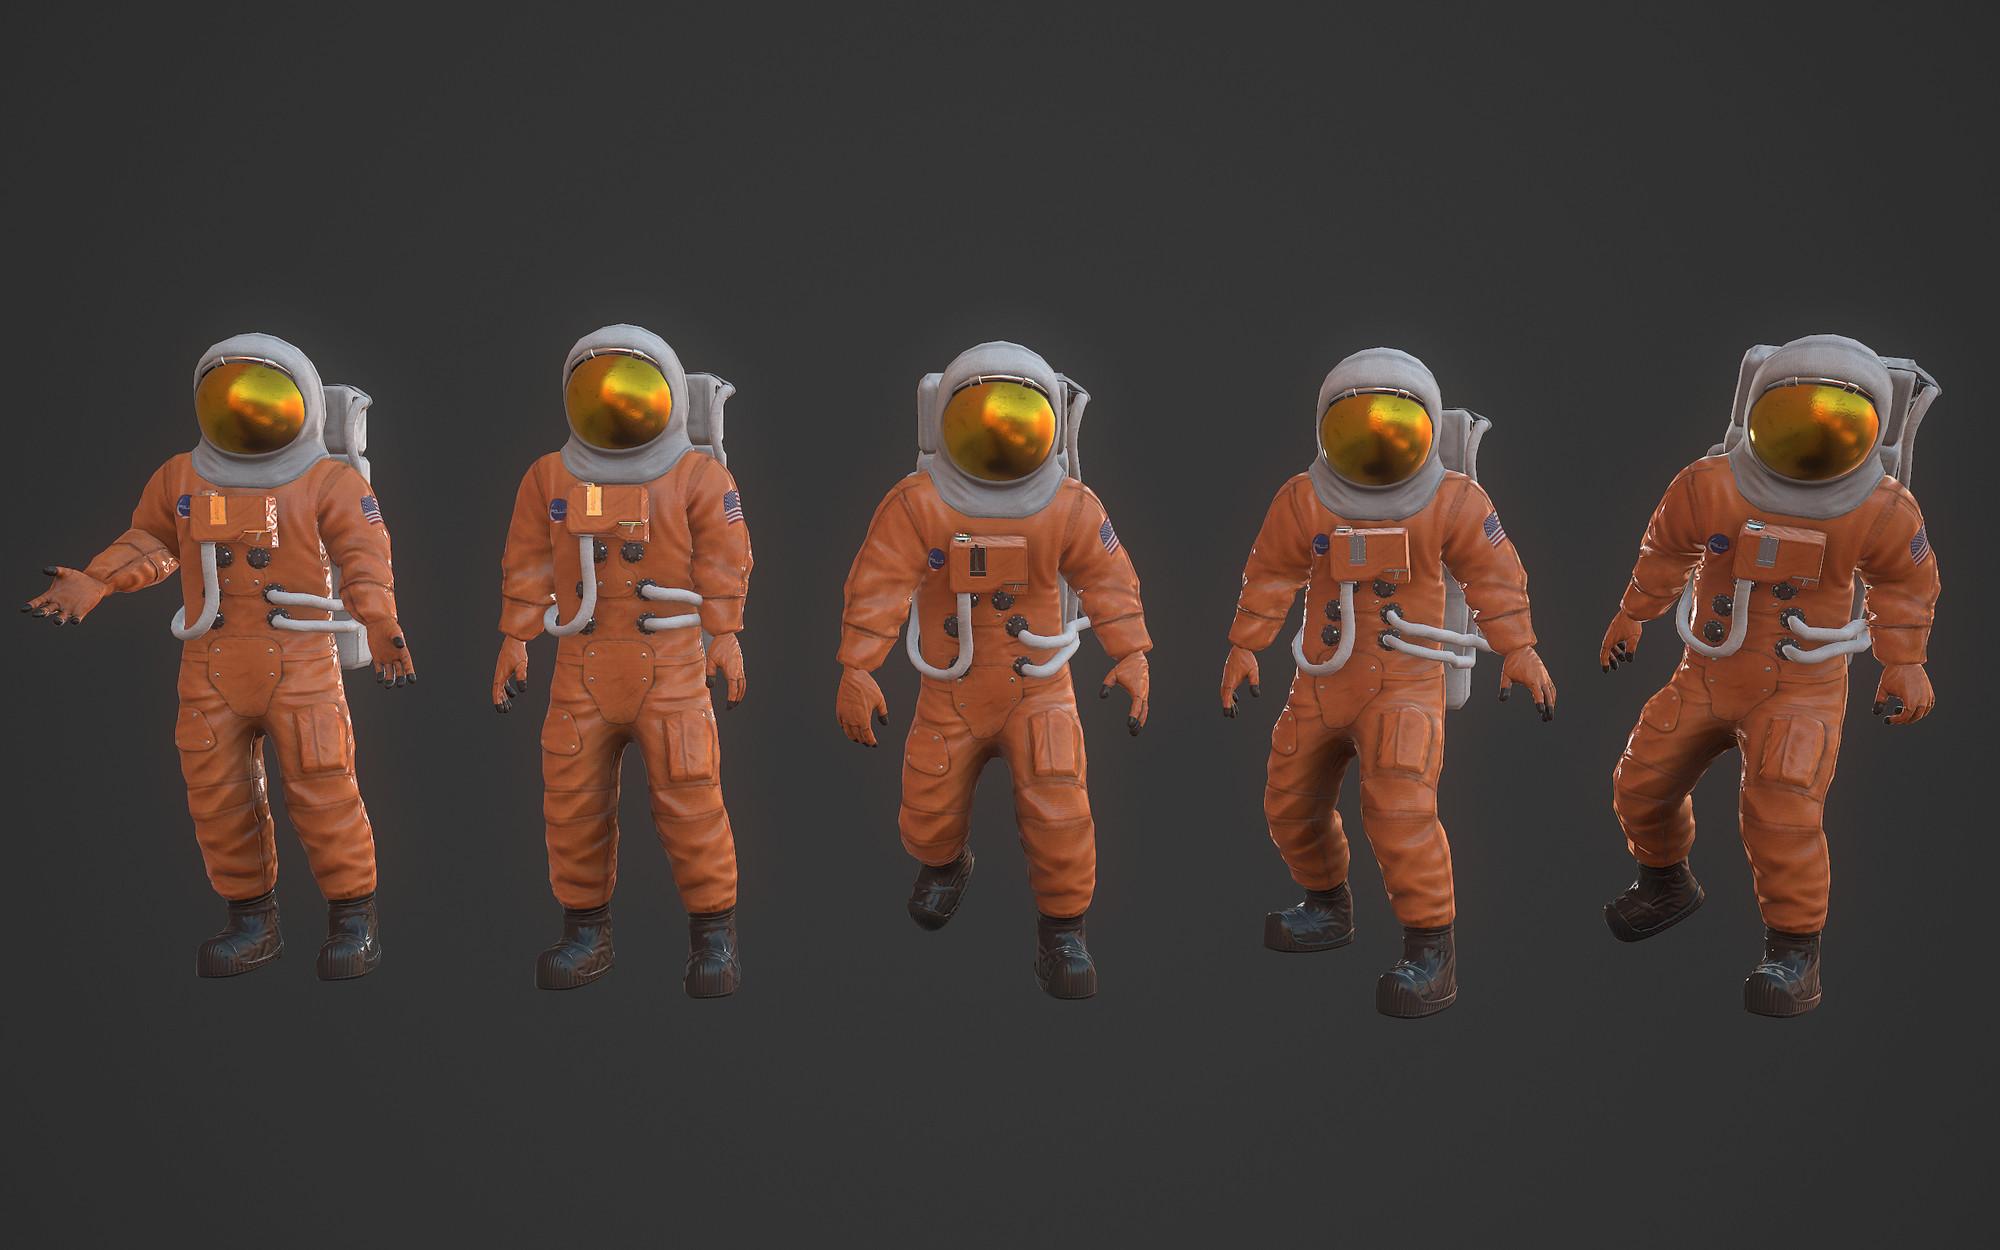 59fca22cb3bc7_Astronaut_PosesTwo.thumb.jpg.417c3ae7b239a36bc9cf74de21e6fb8c.jpg